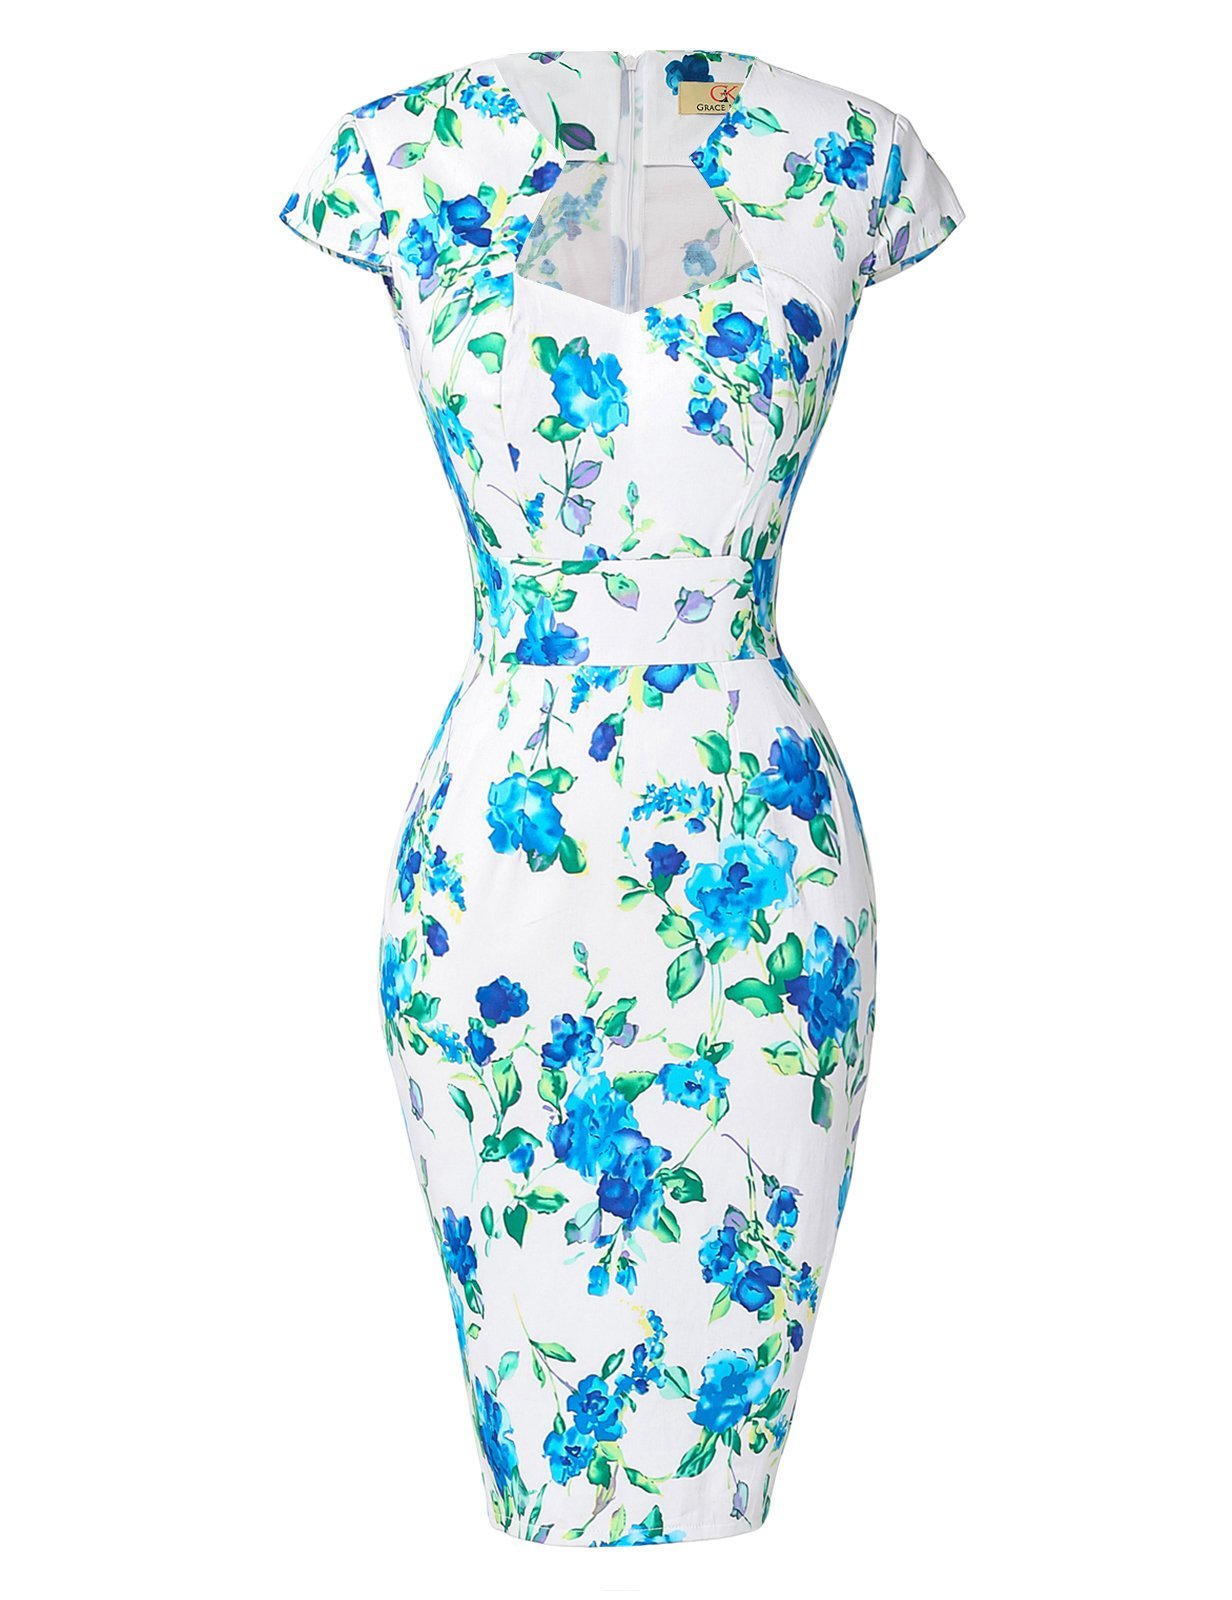 50s Style Blue Floral Wiggle Dress Bodycon Pencil Dresses S CL7597-8